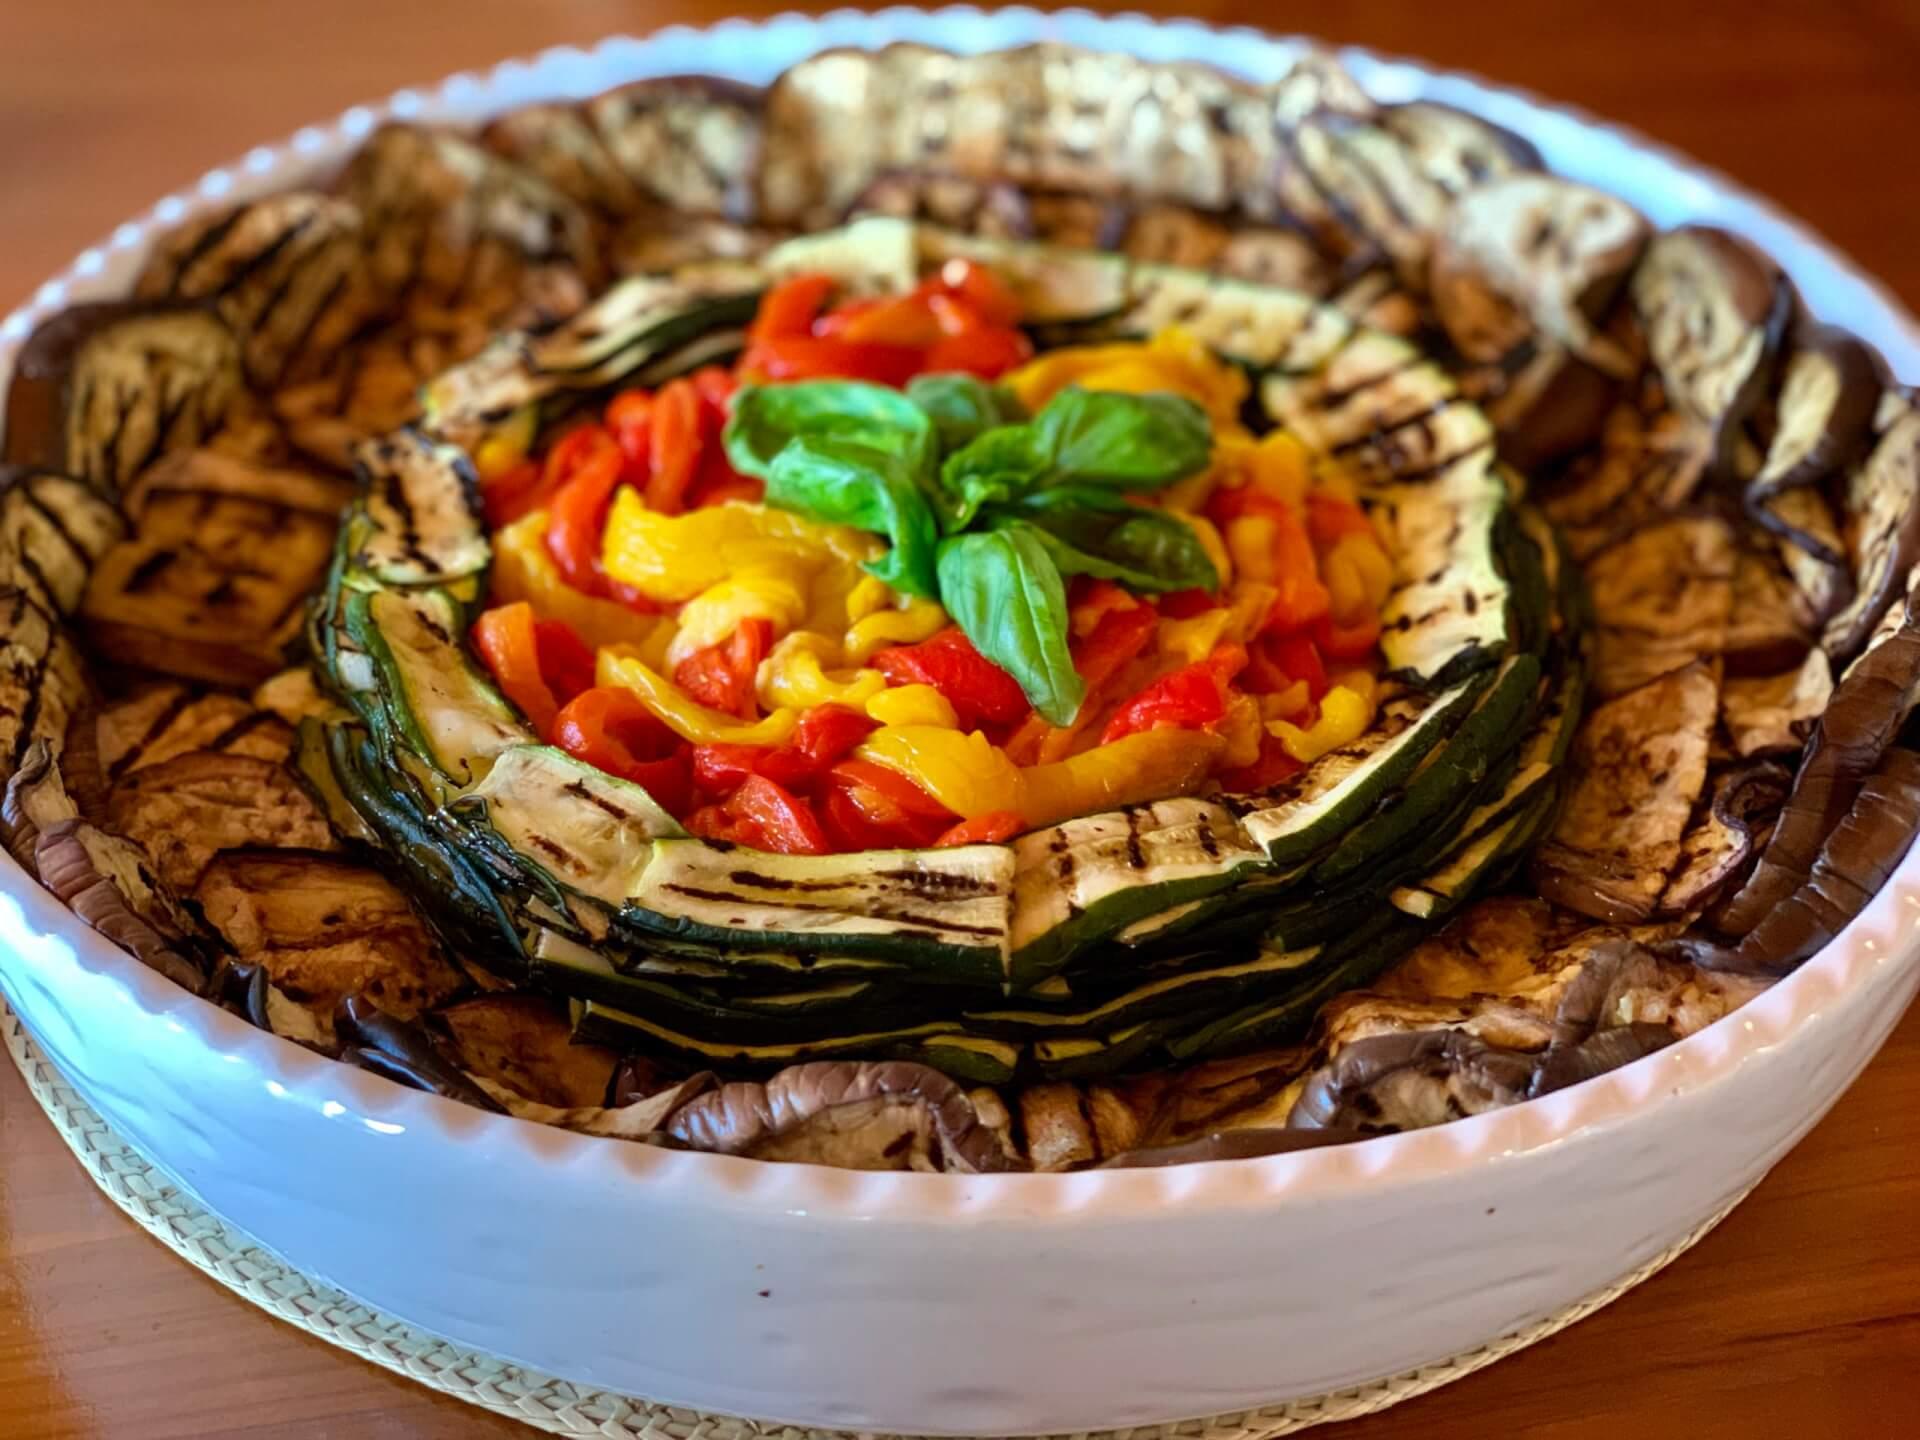 Delicious Vegetarian Food